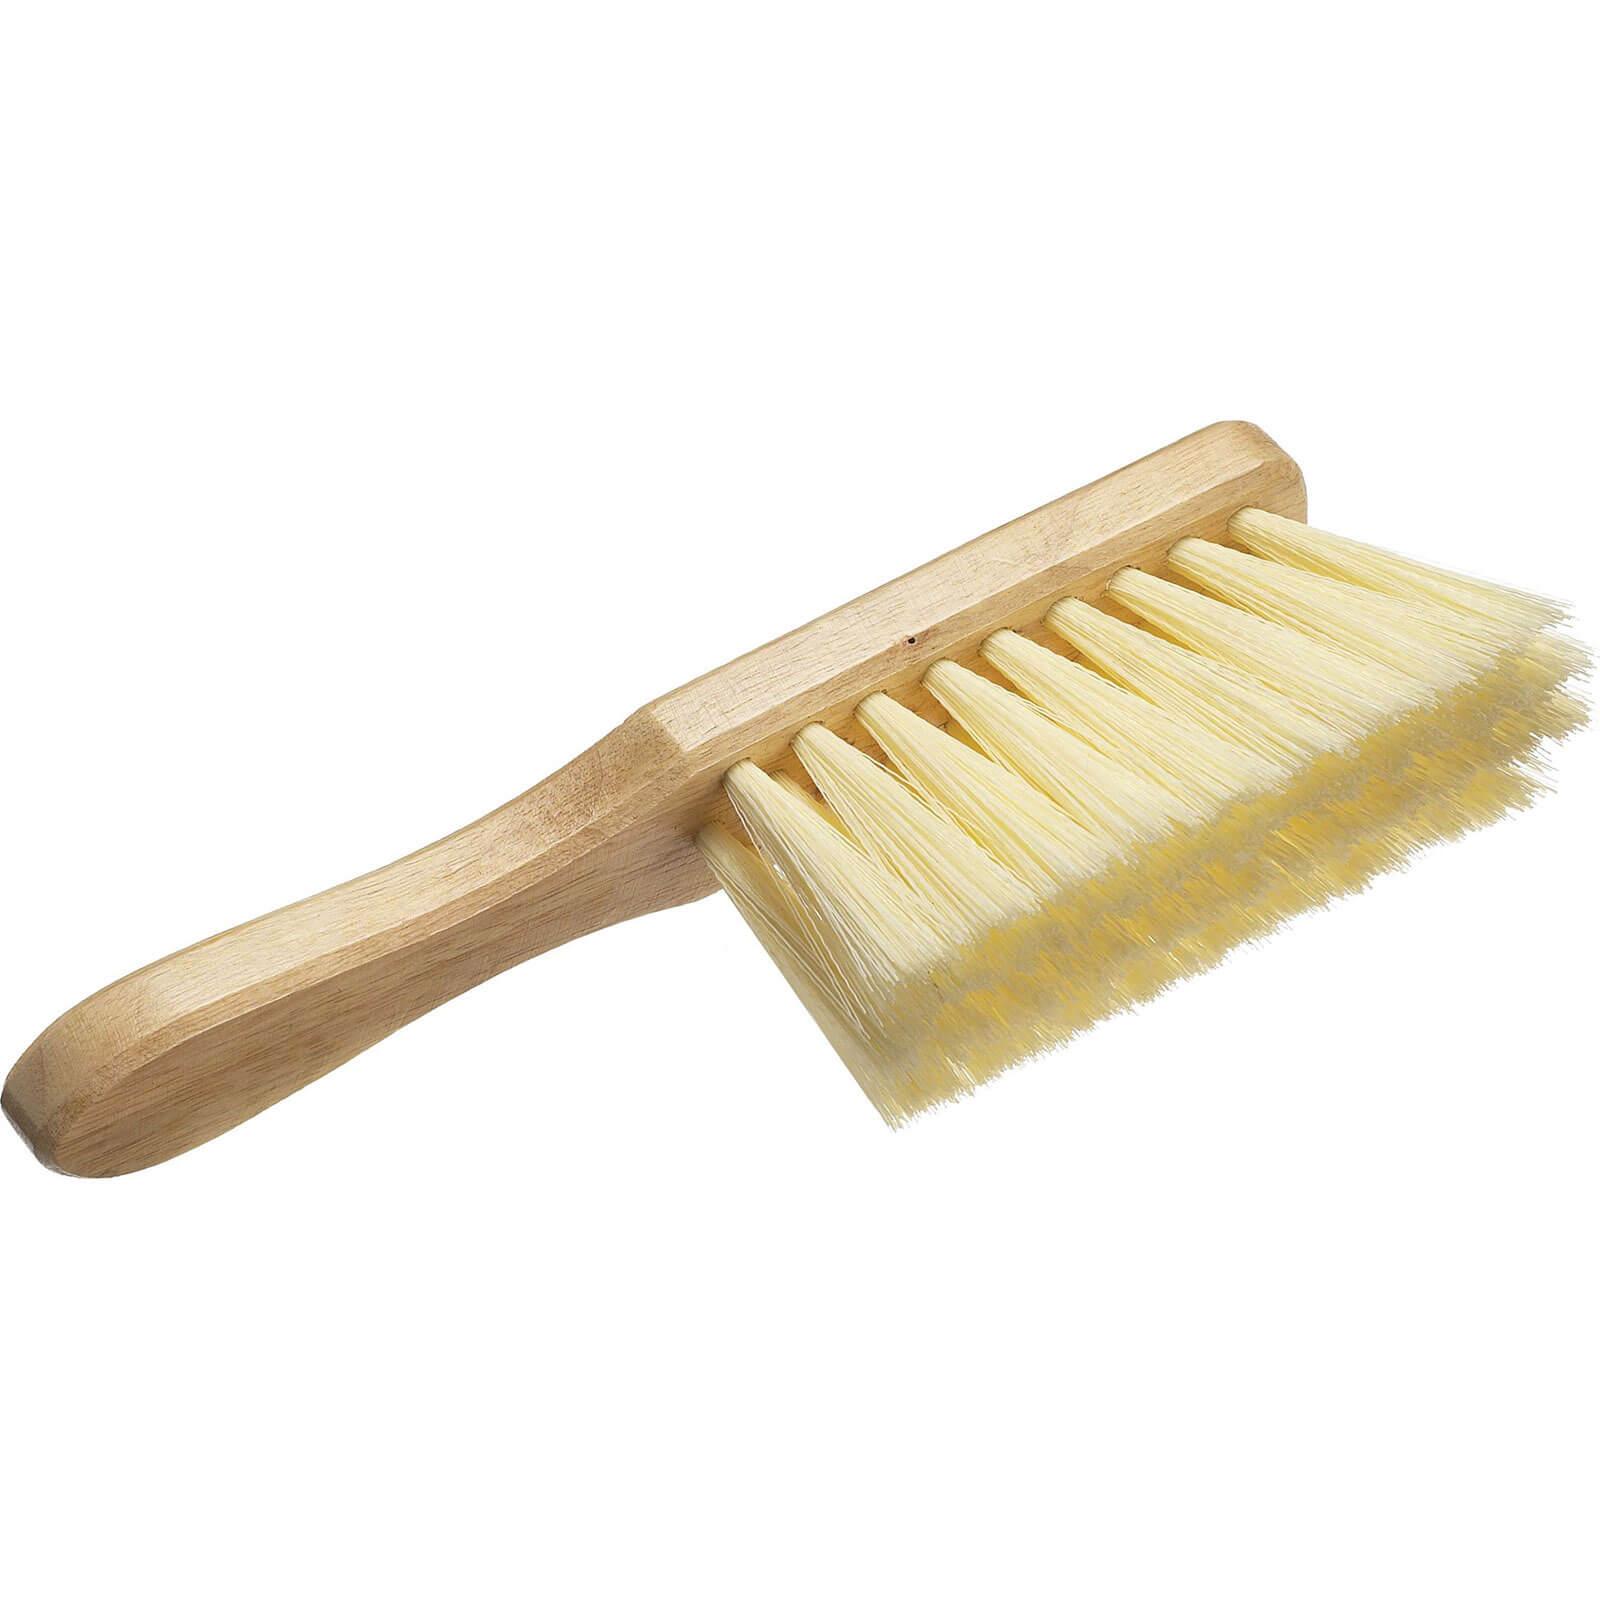 Image of Faithfull Hand Brush Soft Cream PVC